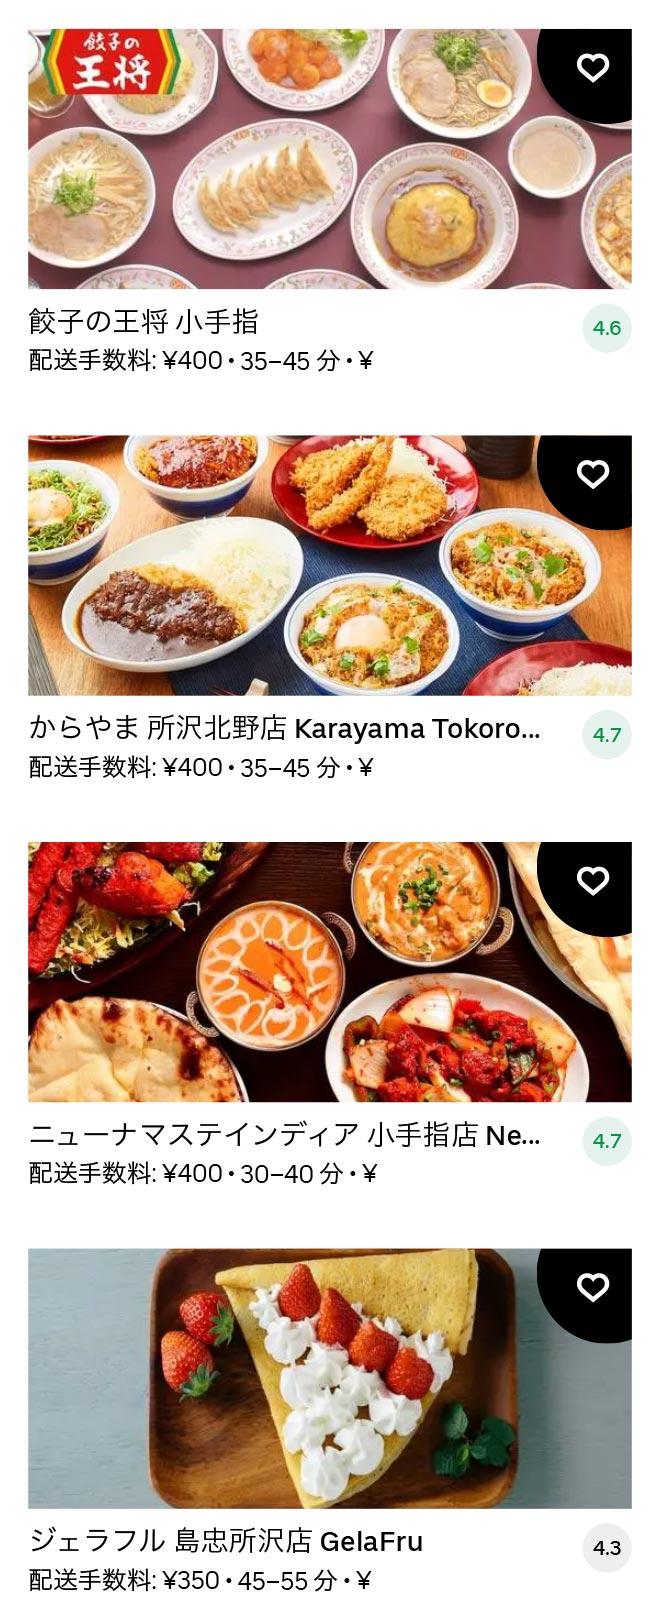 Musashi fujisawa menu 2101 06